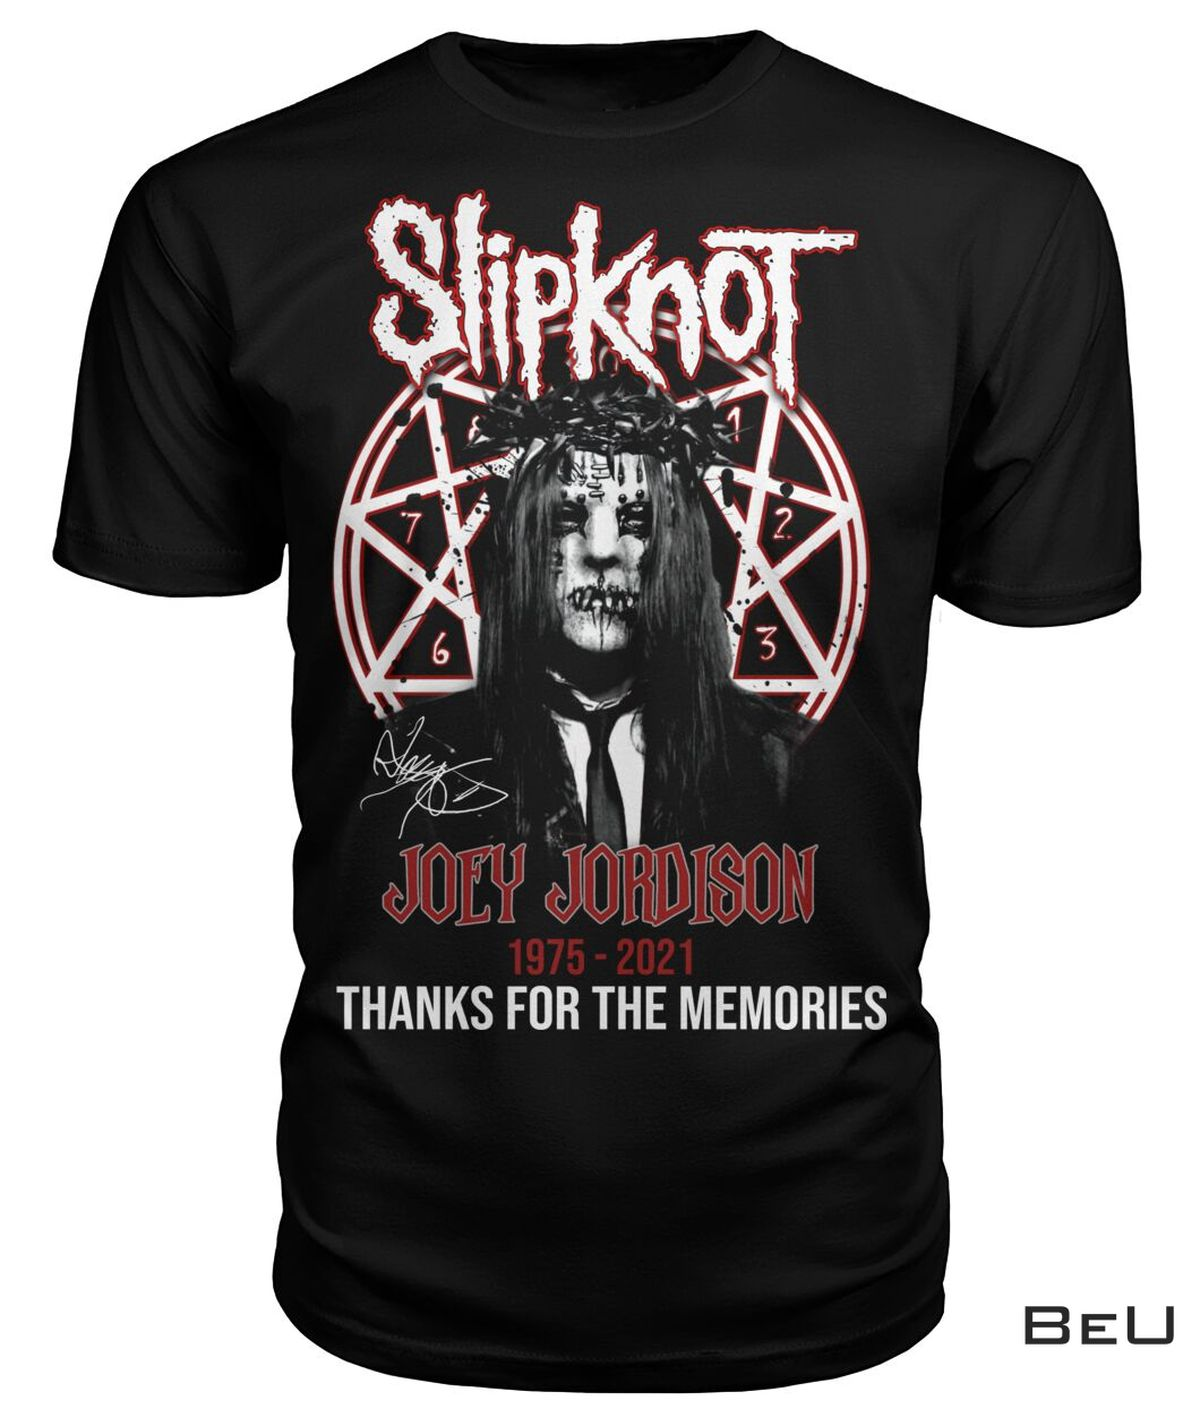 Slipknot Joey Jordison Thank You Shirt, hoodie